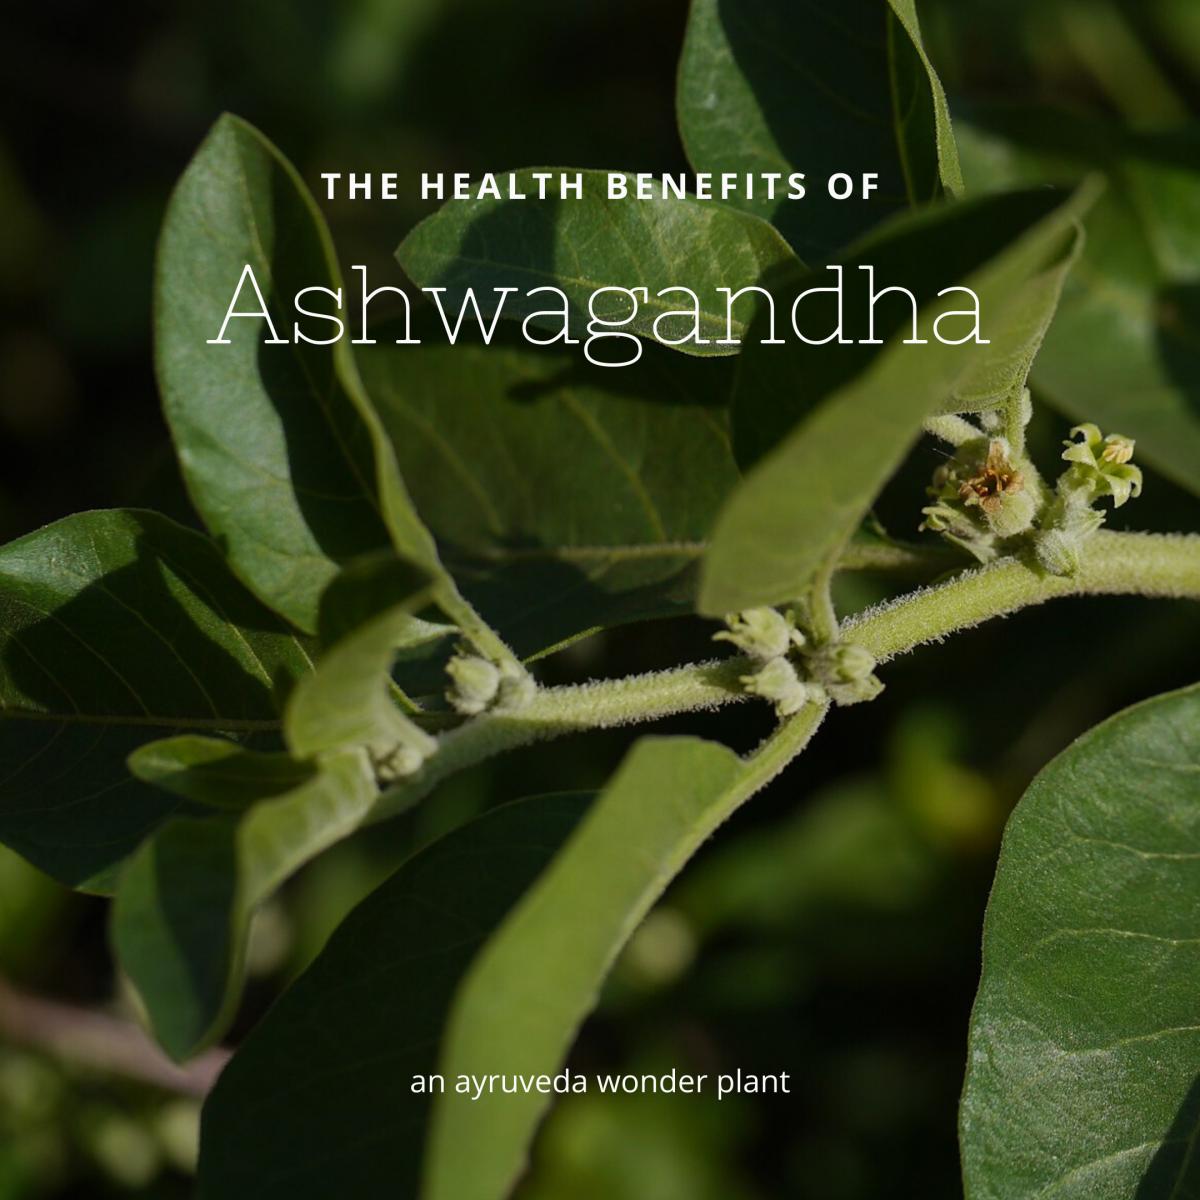 The Health Benefits of Ashwagandha